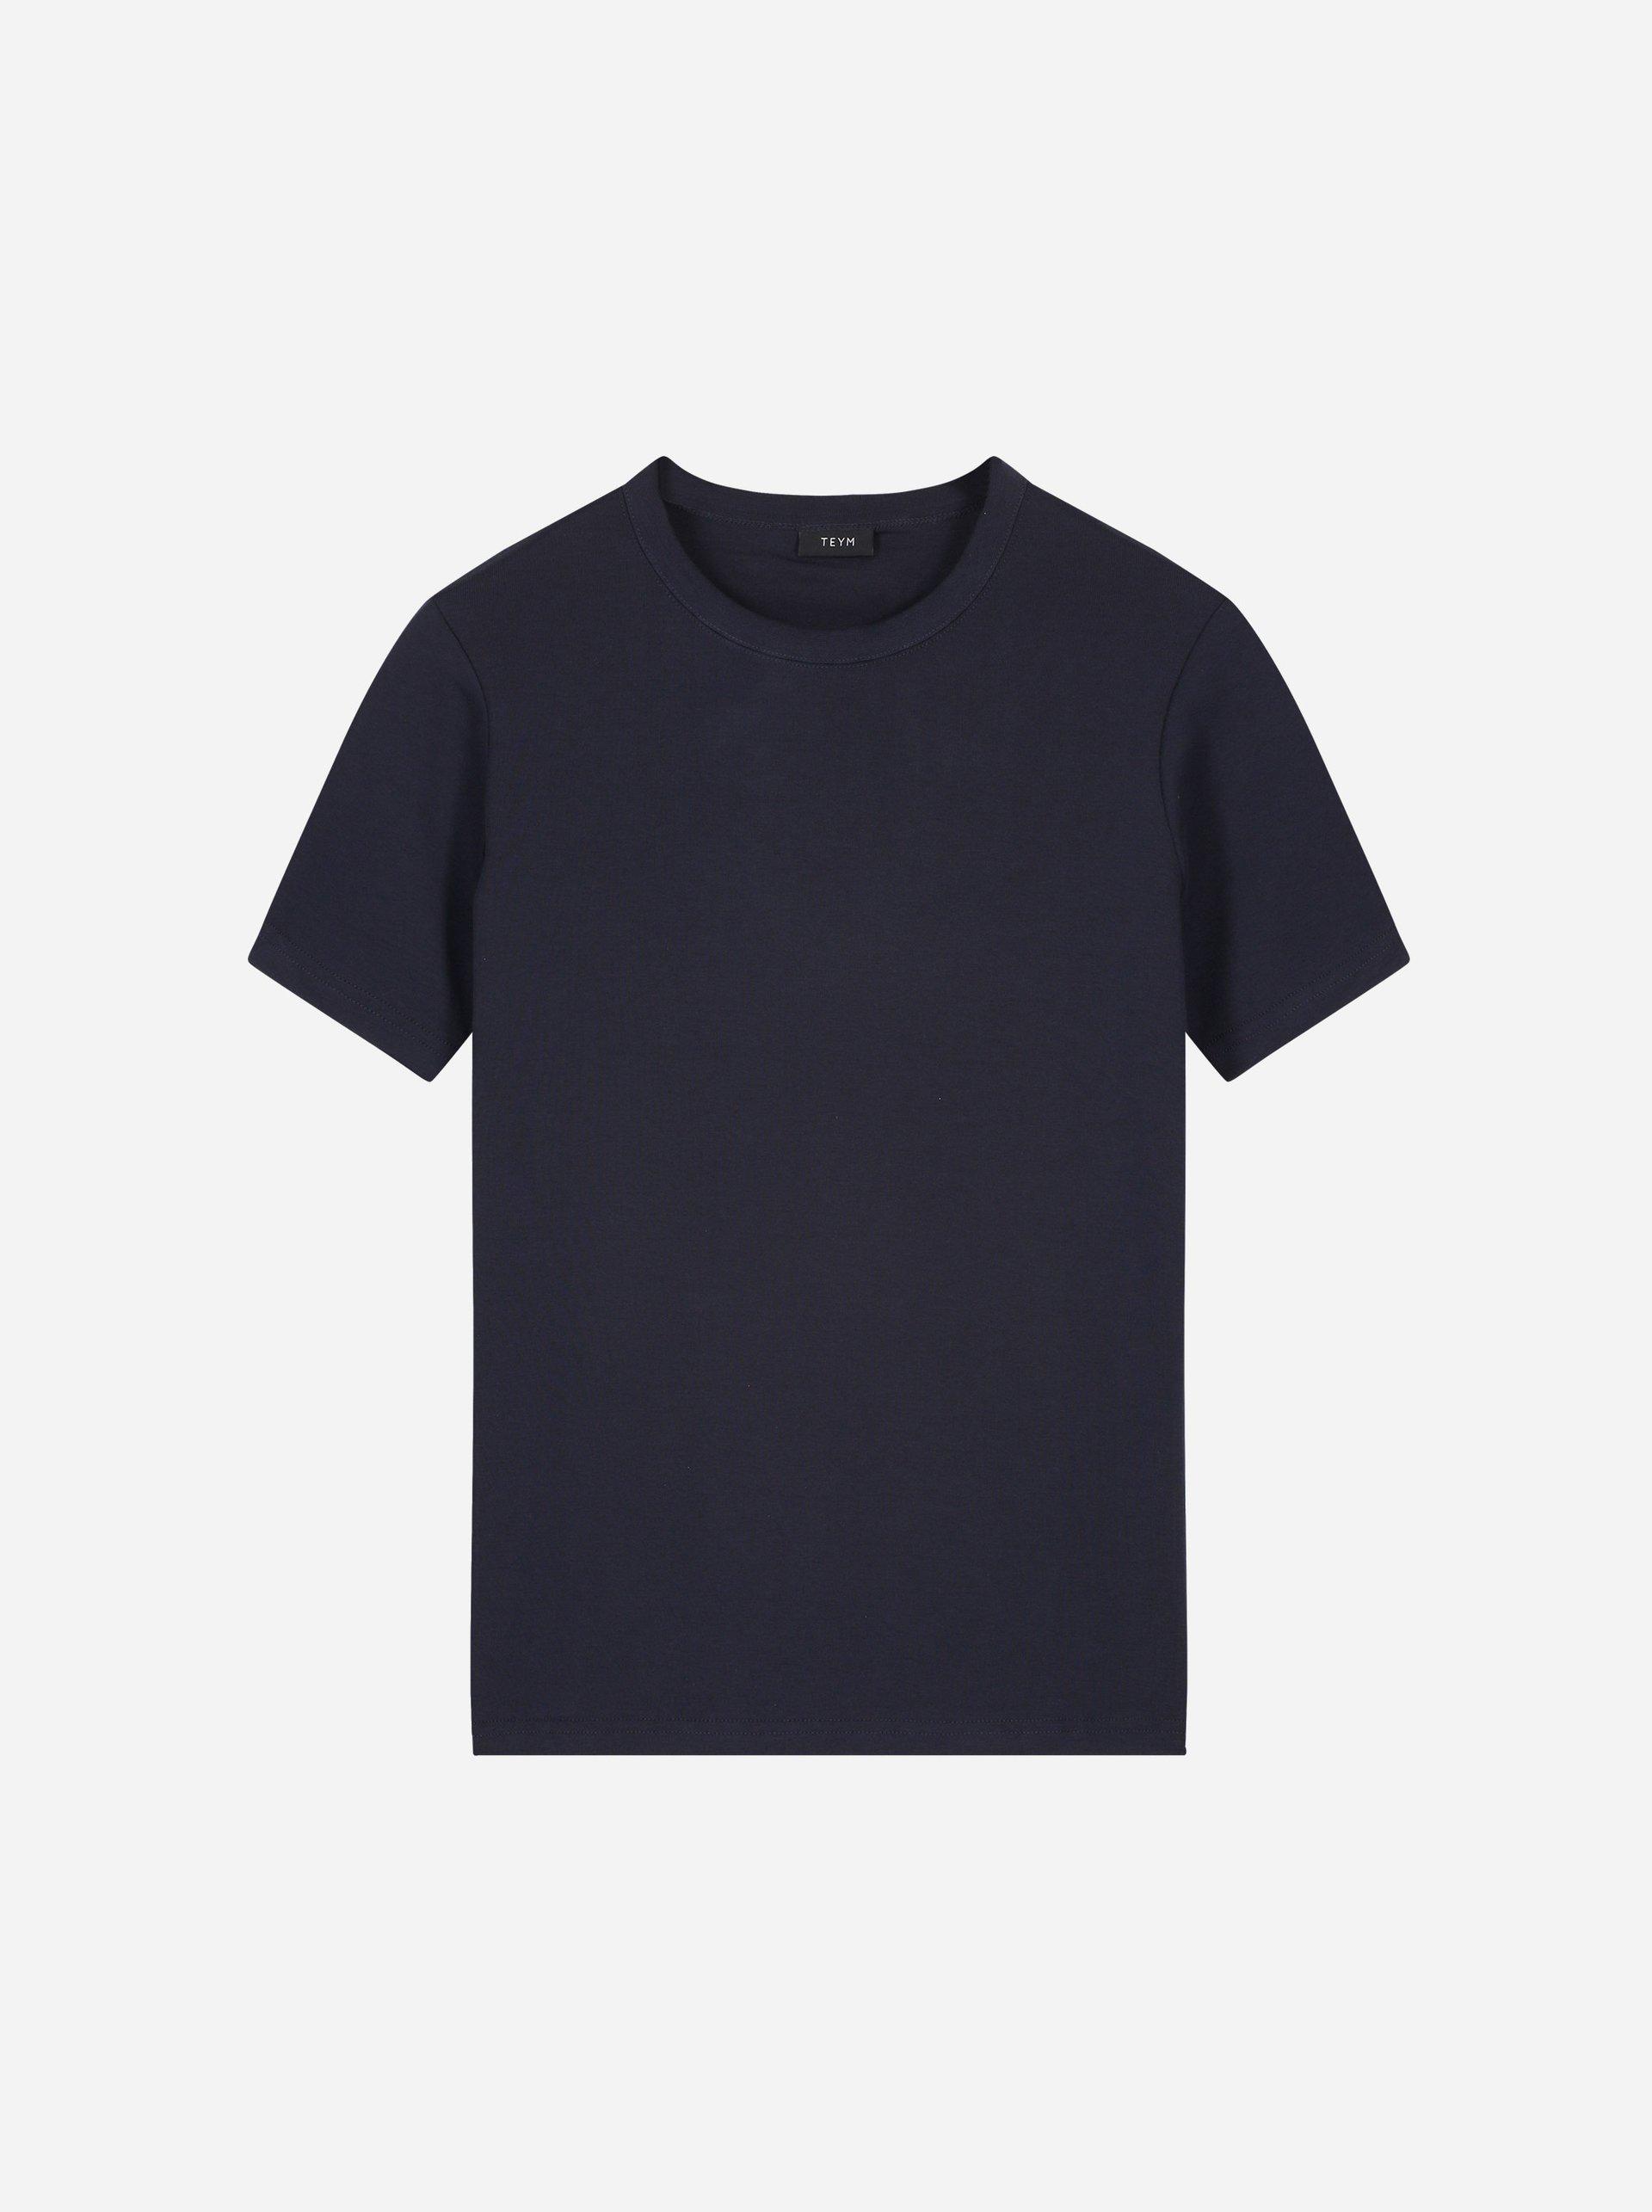 Teym - The T-Shirt - Women - Blue - 4